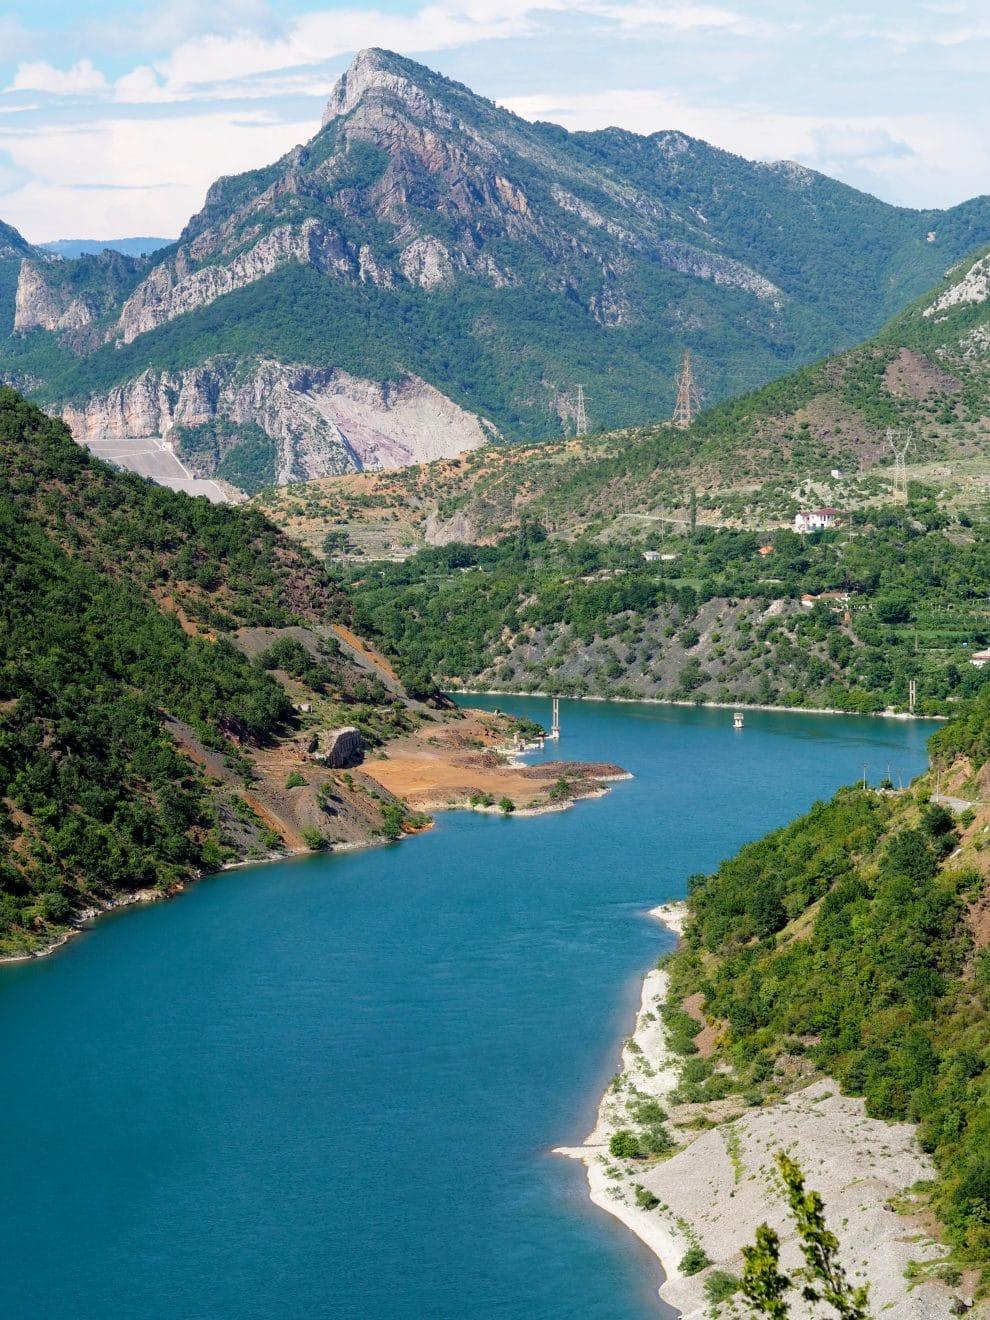 Rondreis door Noord Albanië - Lake Komani